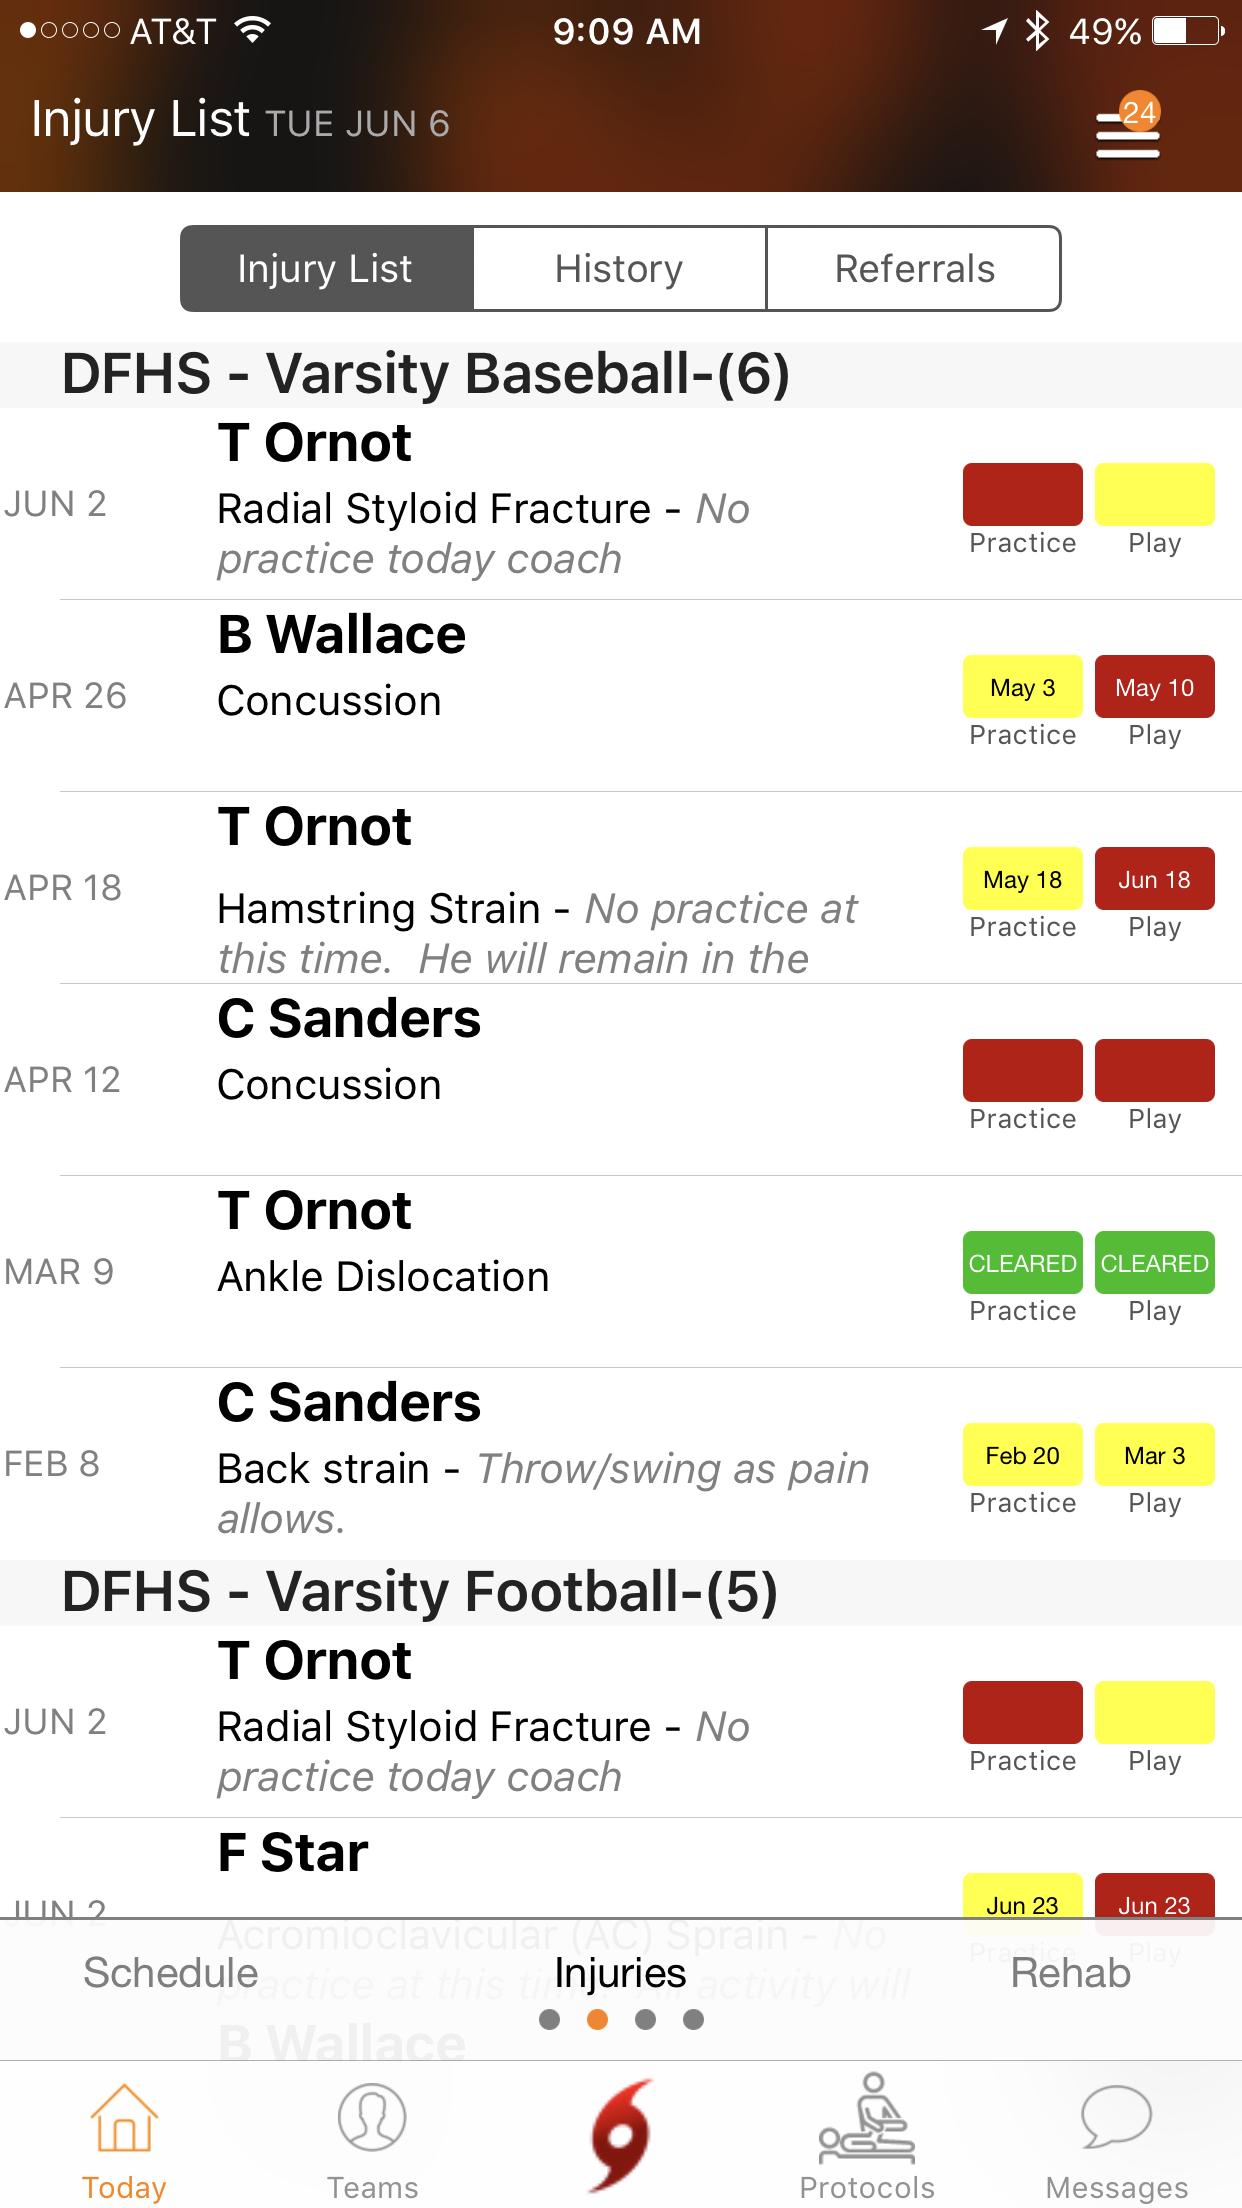 injury-list Screenshot.png